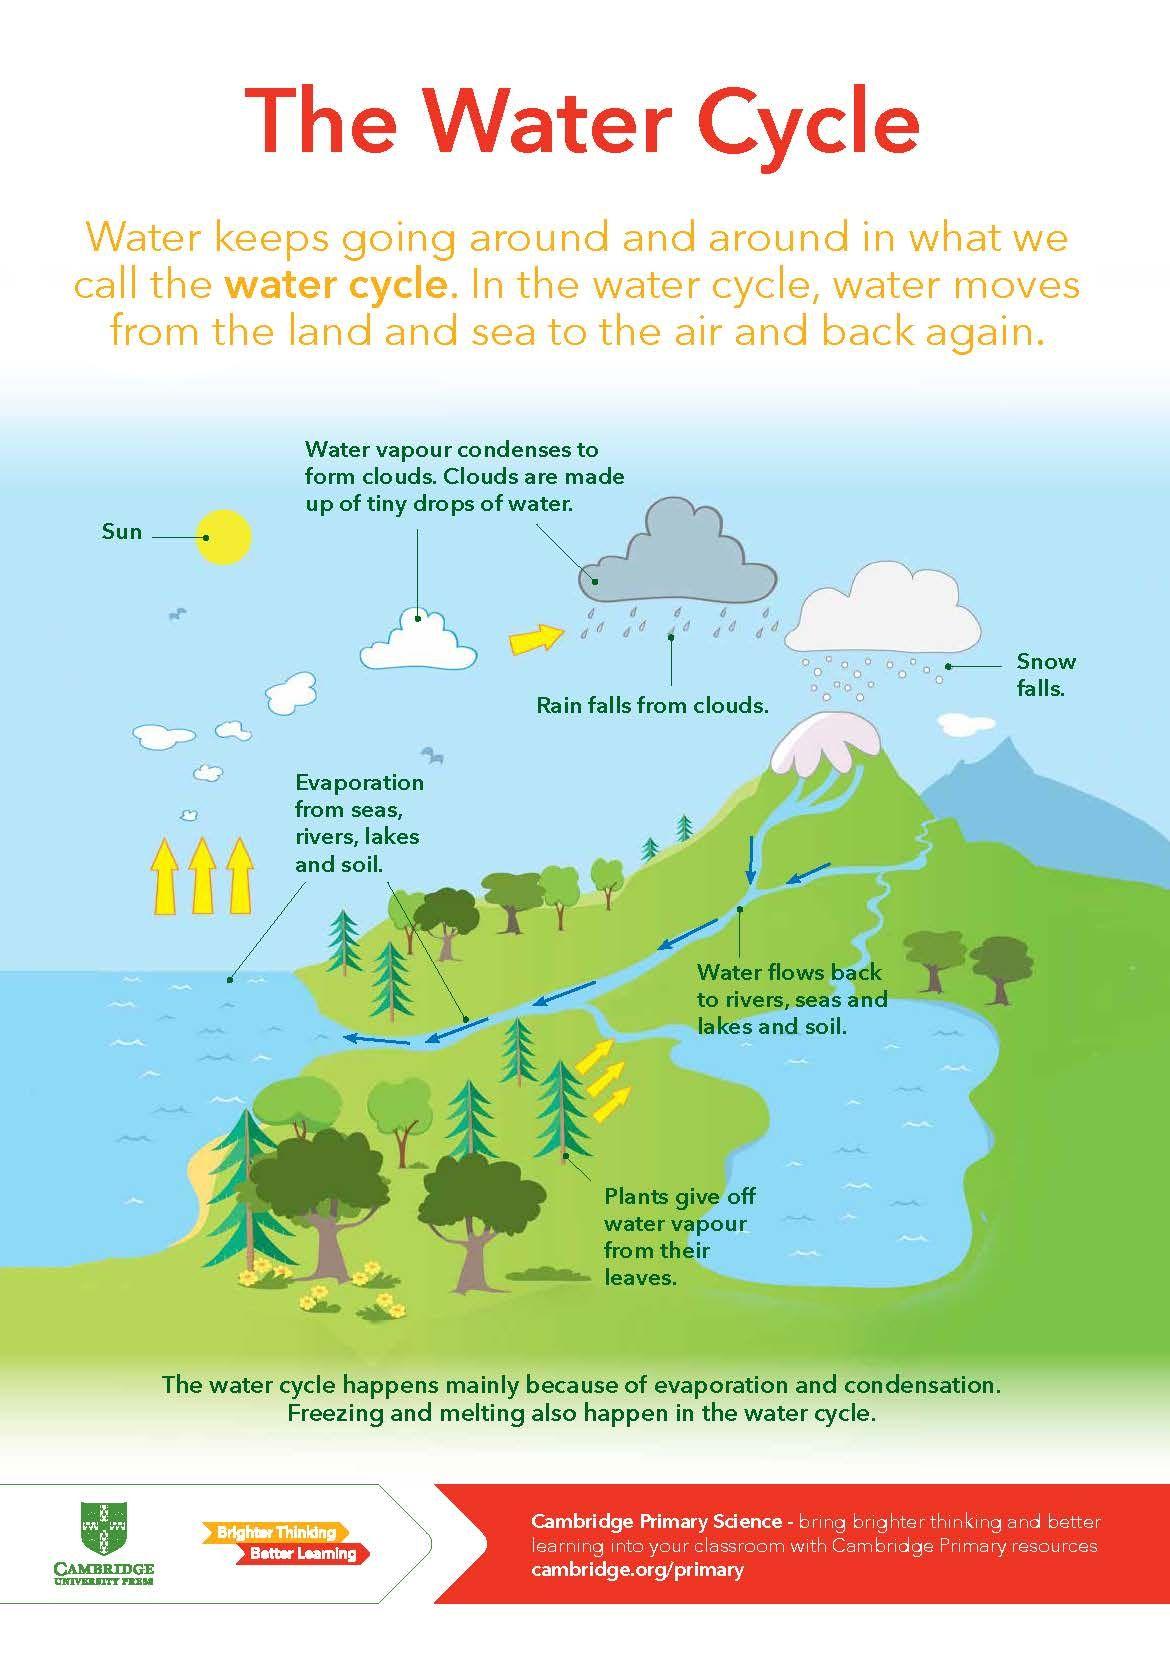 medium resolution of Cambridge Primary Science - The Water Cycle   Cambridge primary